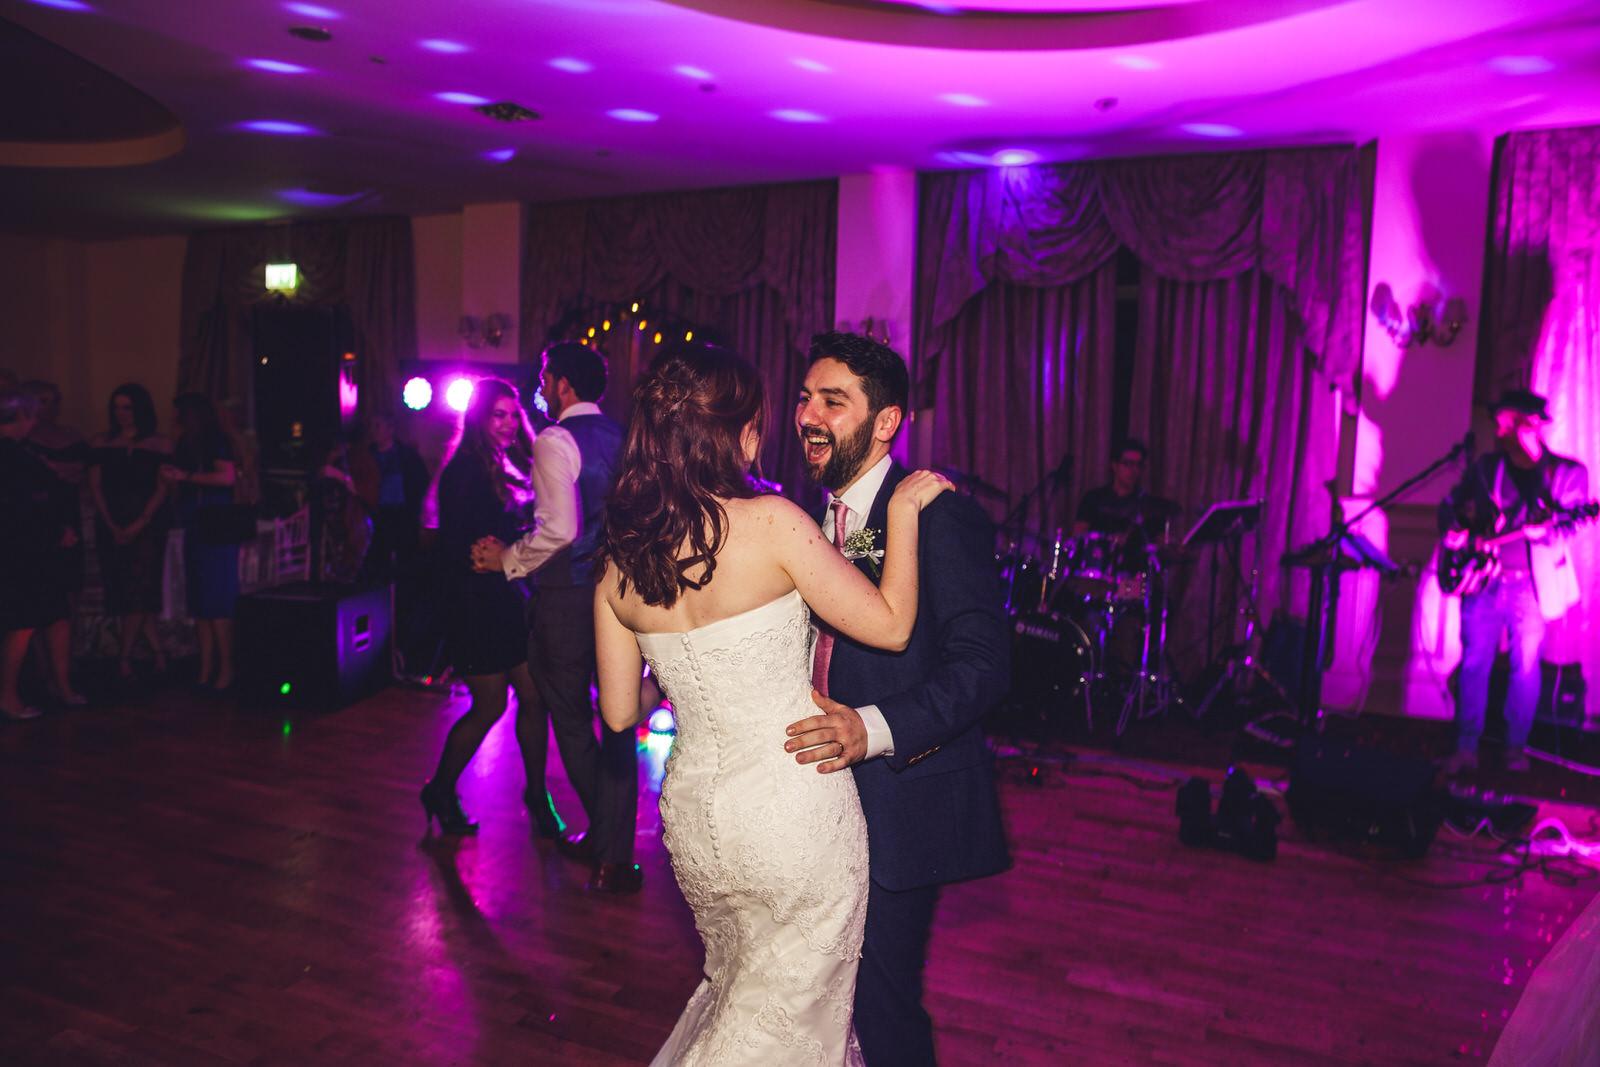 Roger-kenny-wedding-photographer-greystones-wicklow-dublin_127.jpg